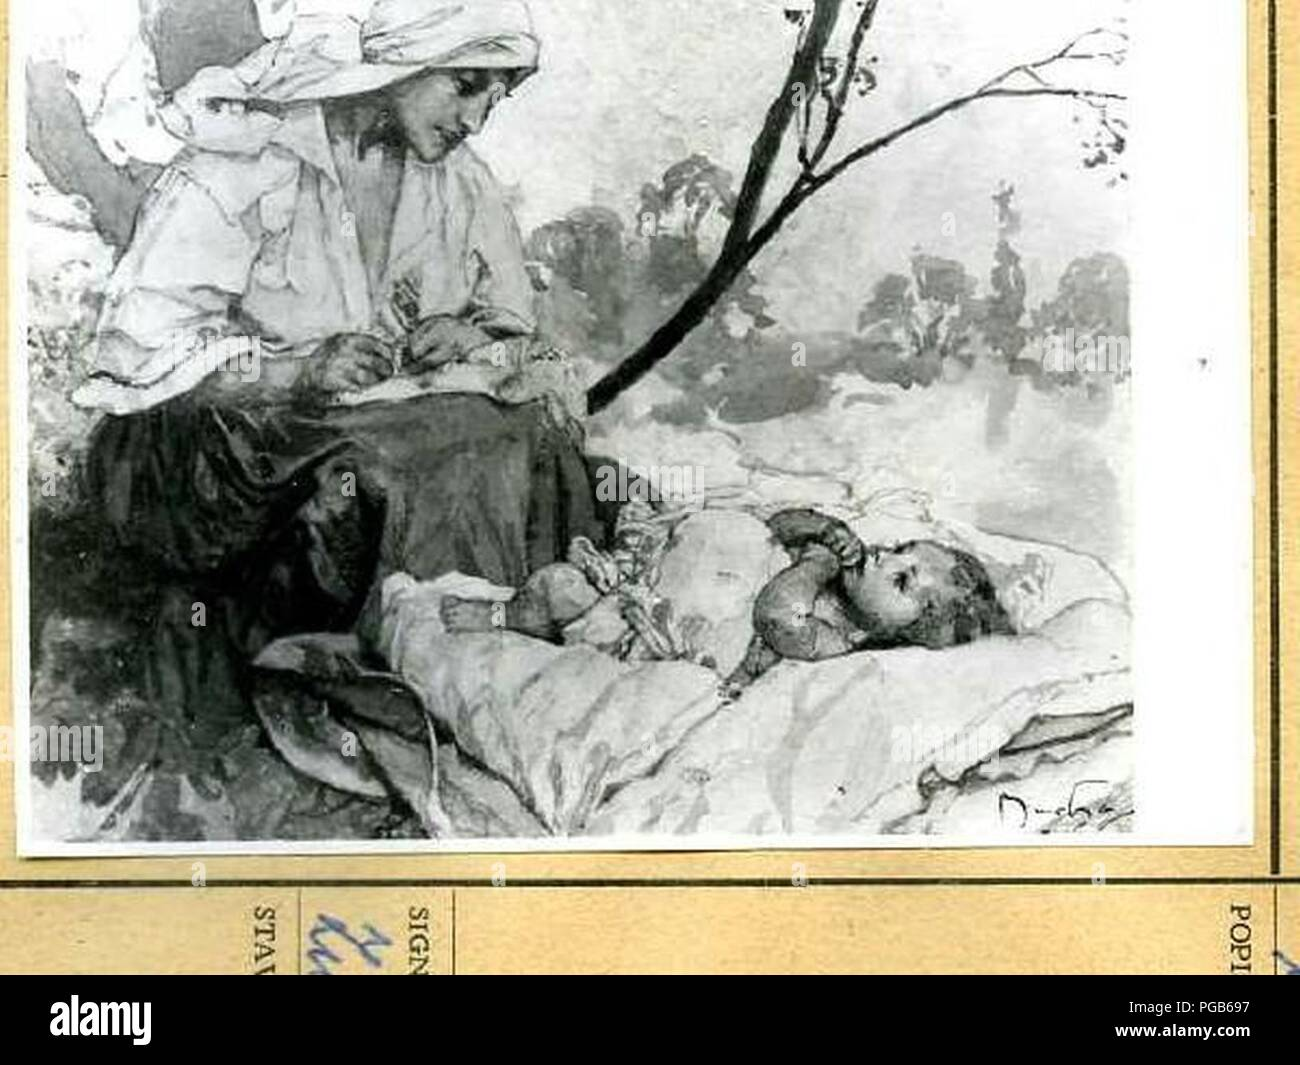 Autor Alfons Mucha 24.7.1860-14.7.1939 - Matka sedici nad ditetem - ilustrace ke knize Slavia starostlivym matkam. Foto de stock